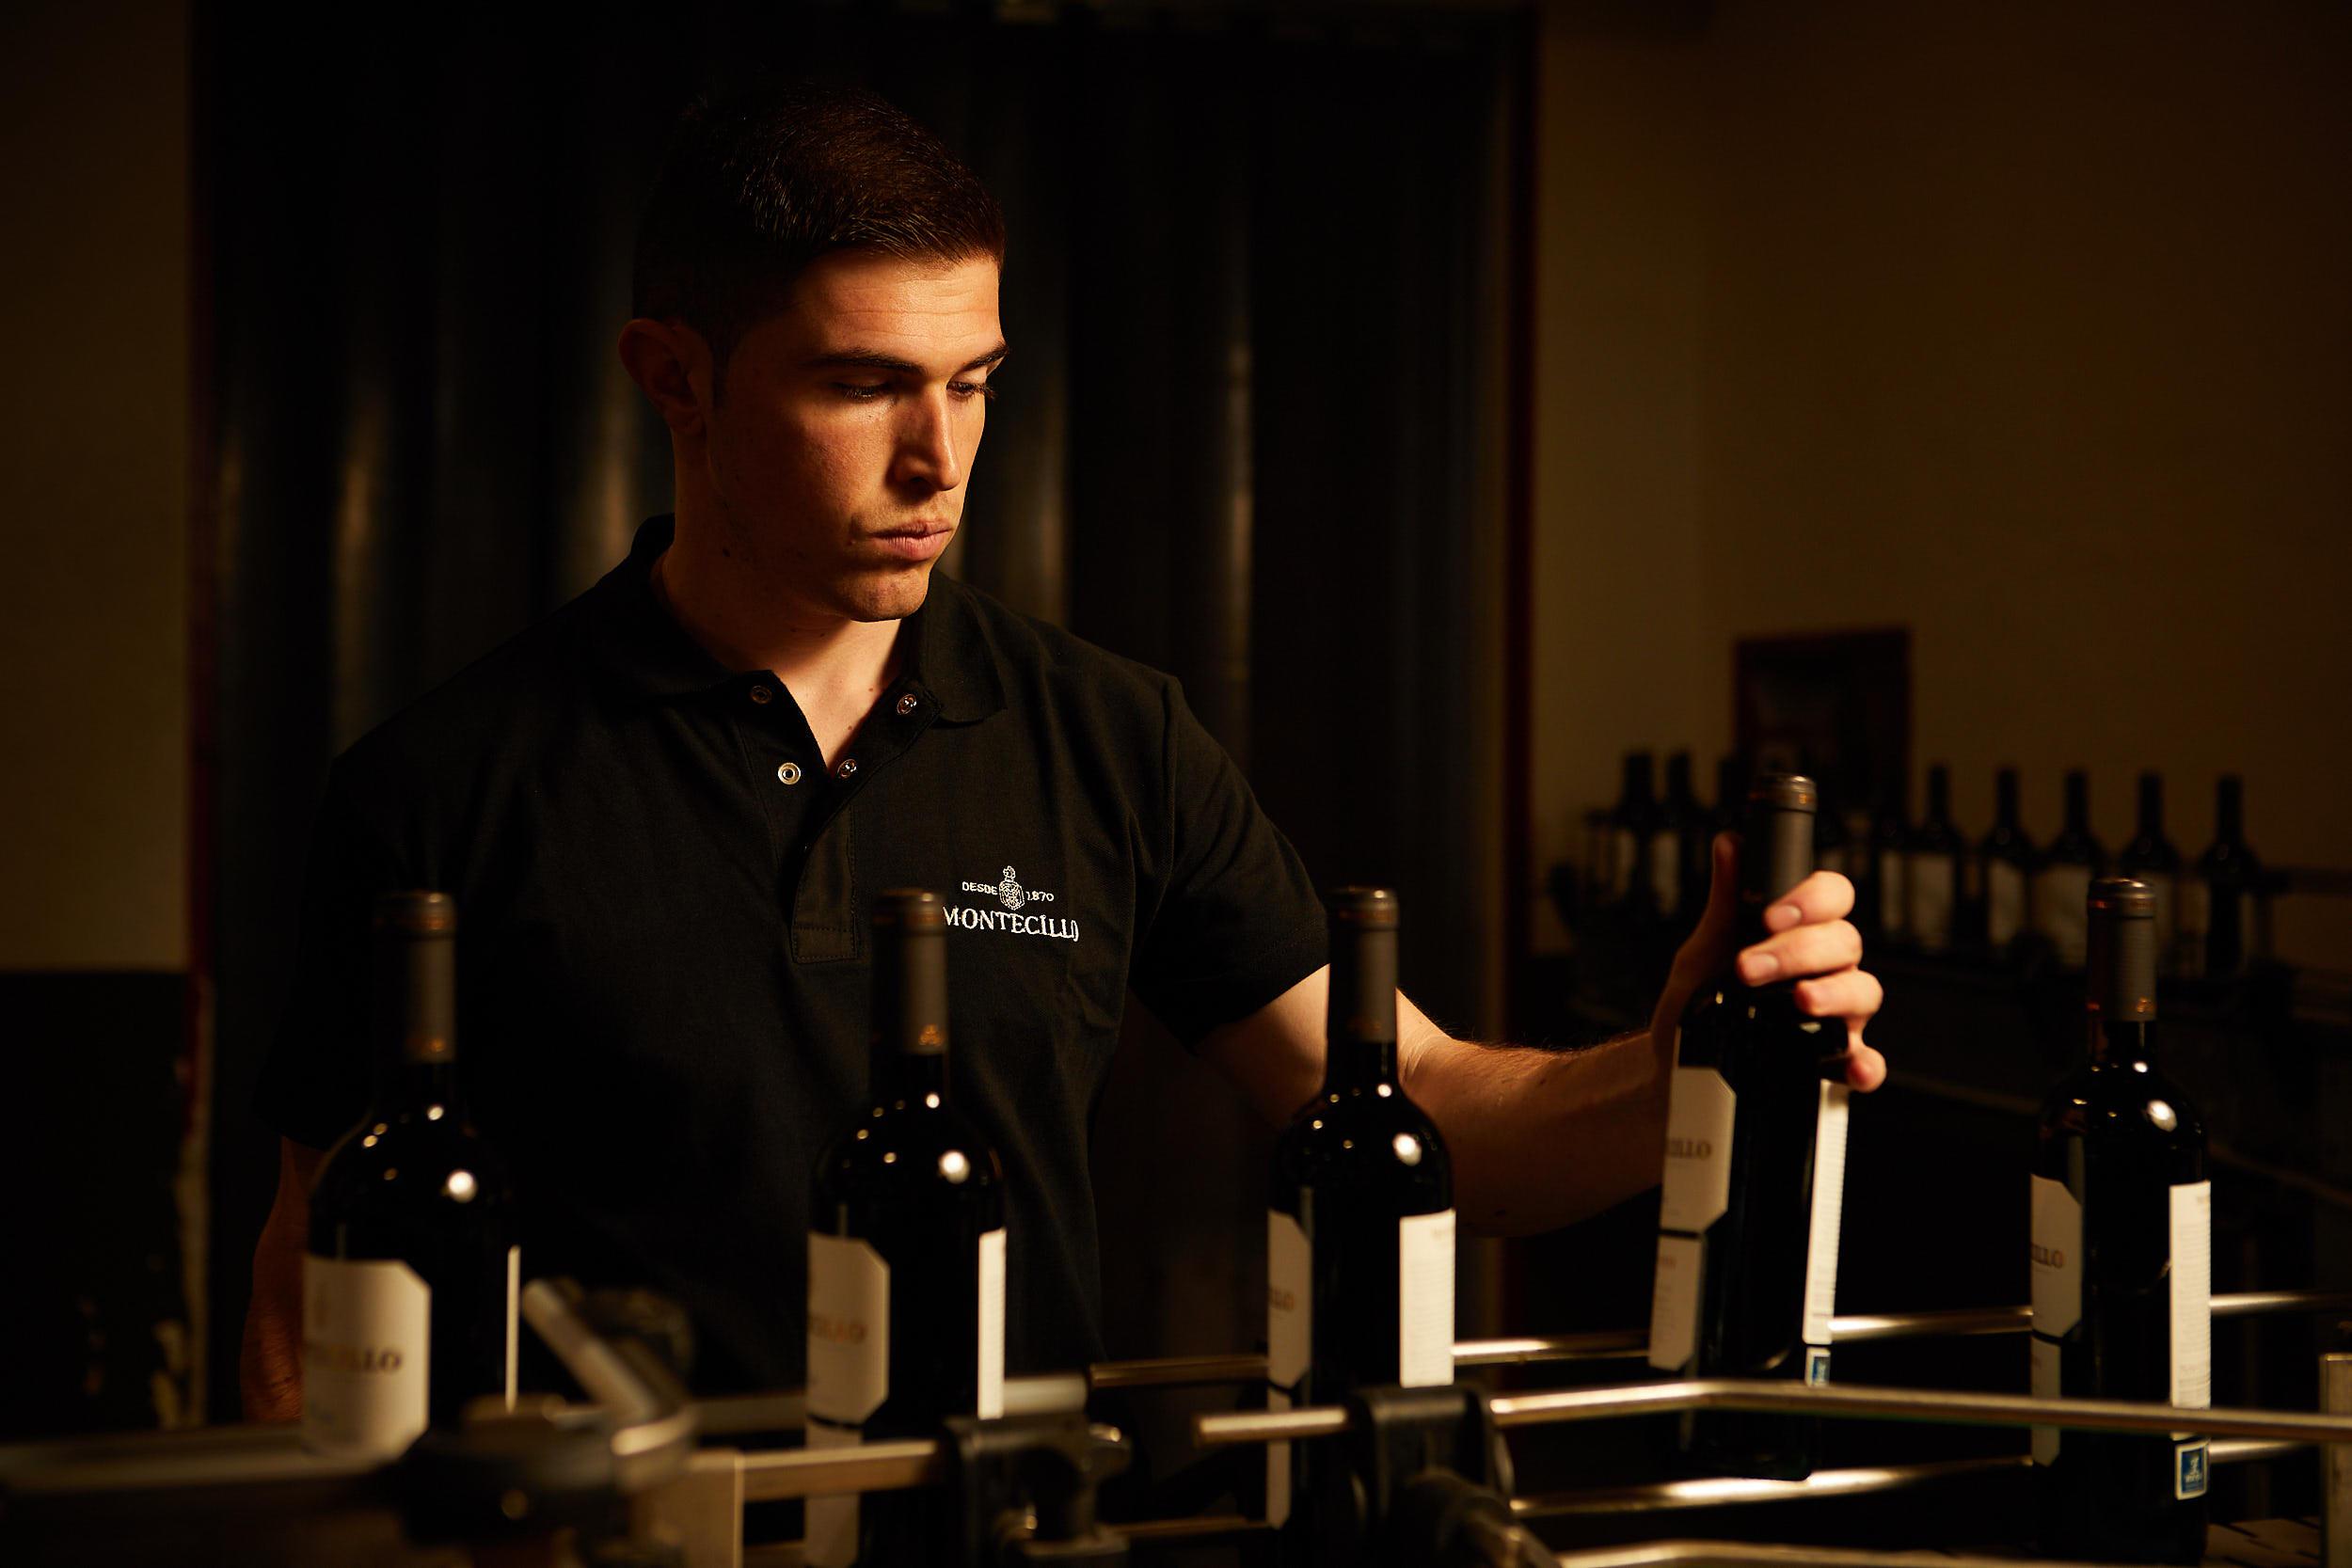 1805Basque_Country_Rioja_Spain_Corporate_Photographer_James_Sturcke_0003.jpg